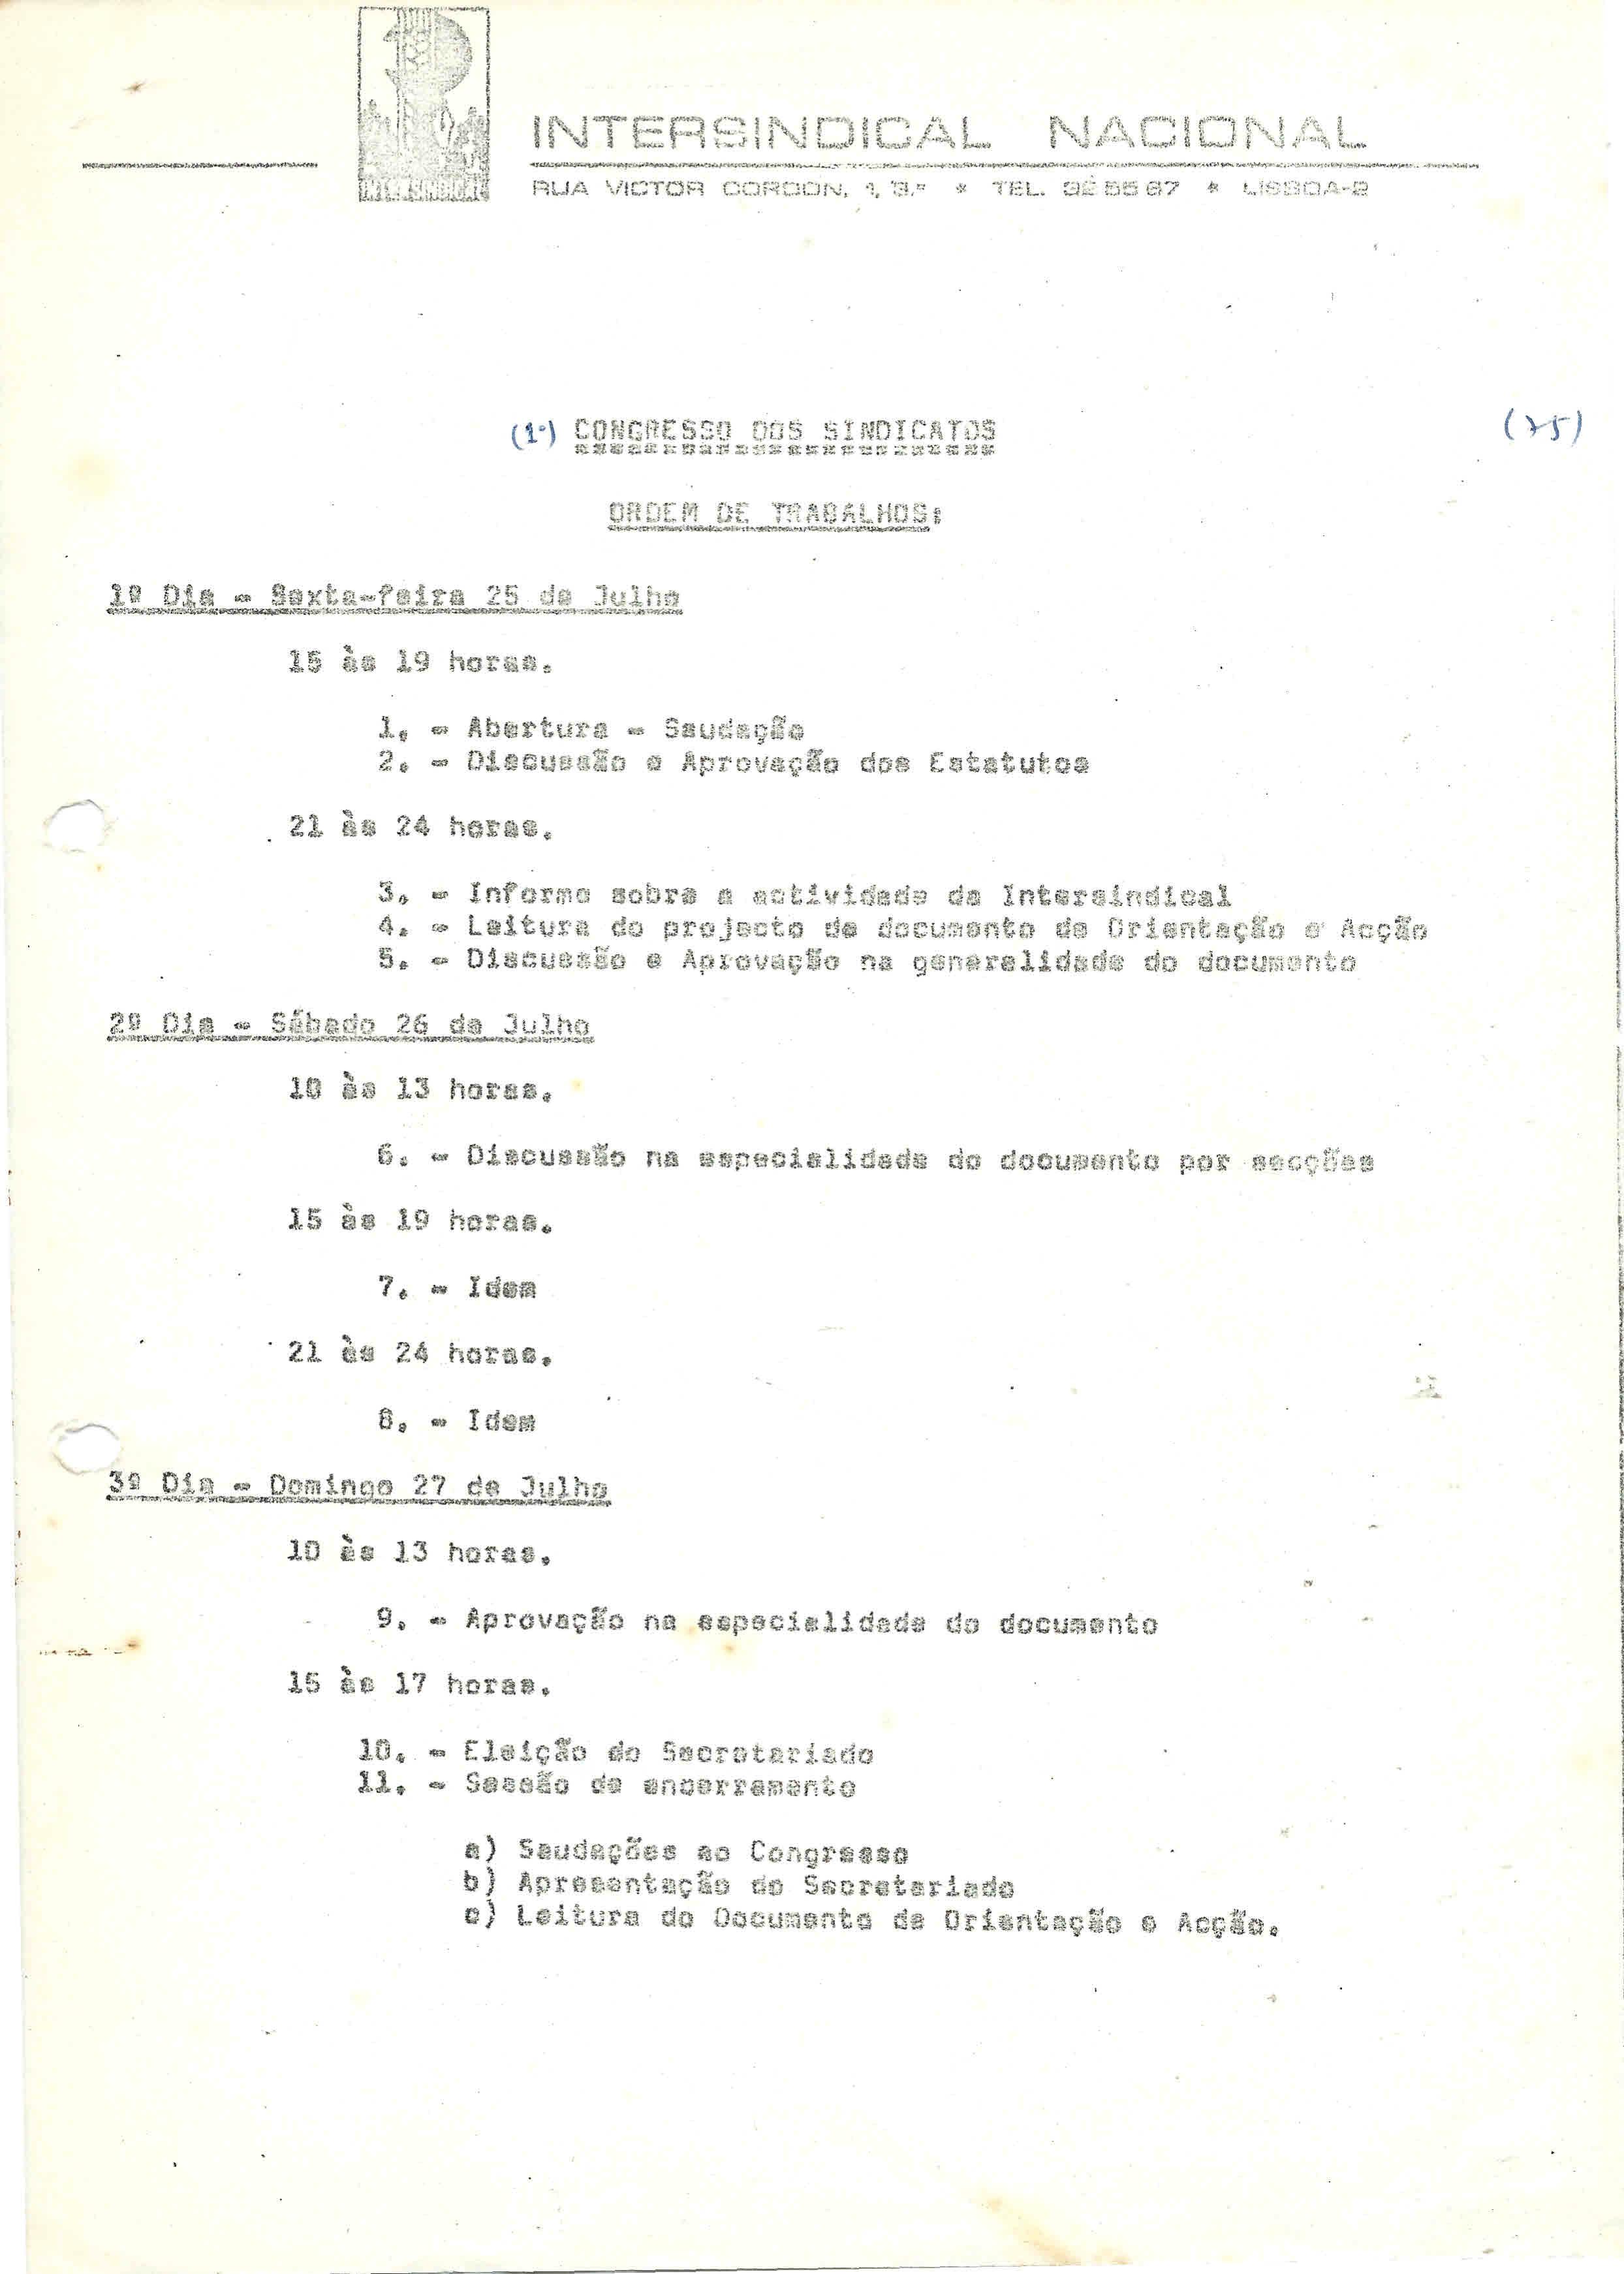 intersindical ot 1976